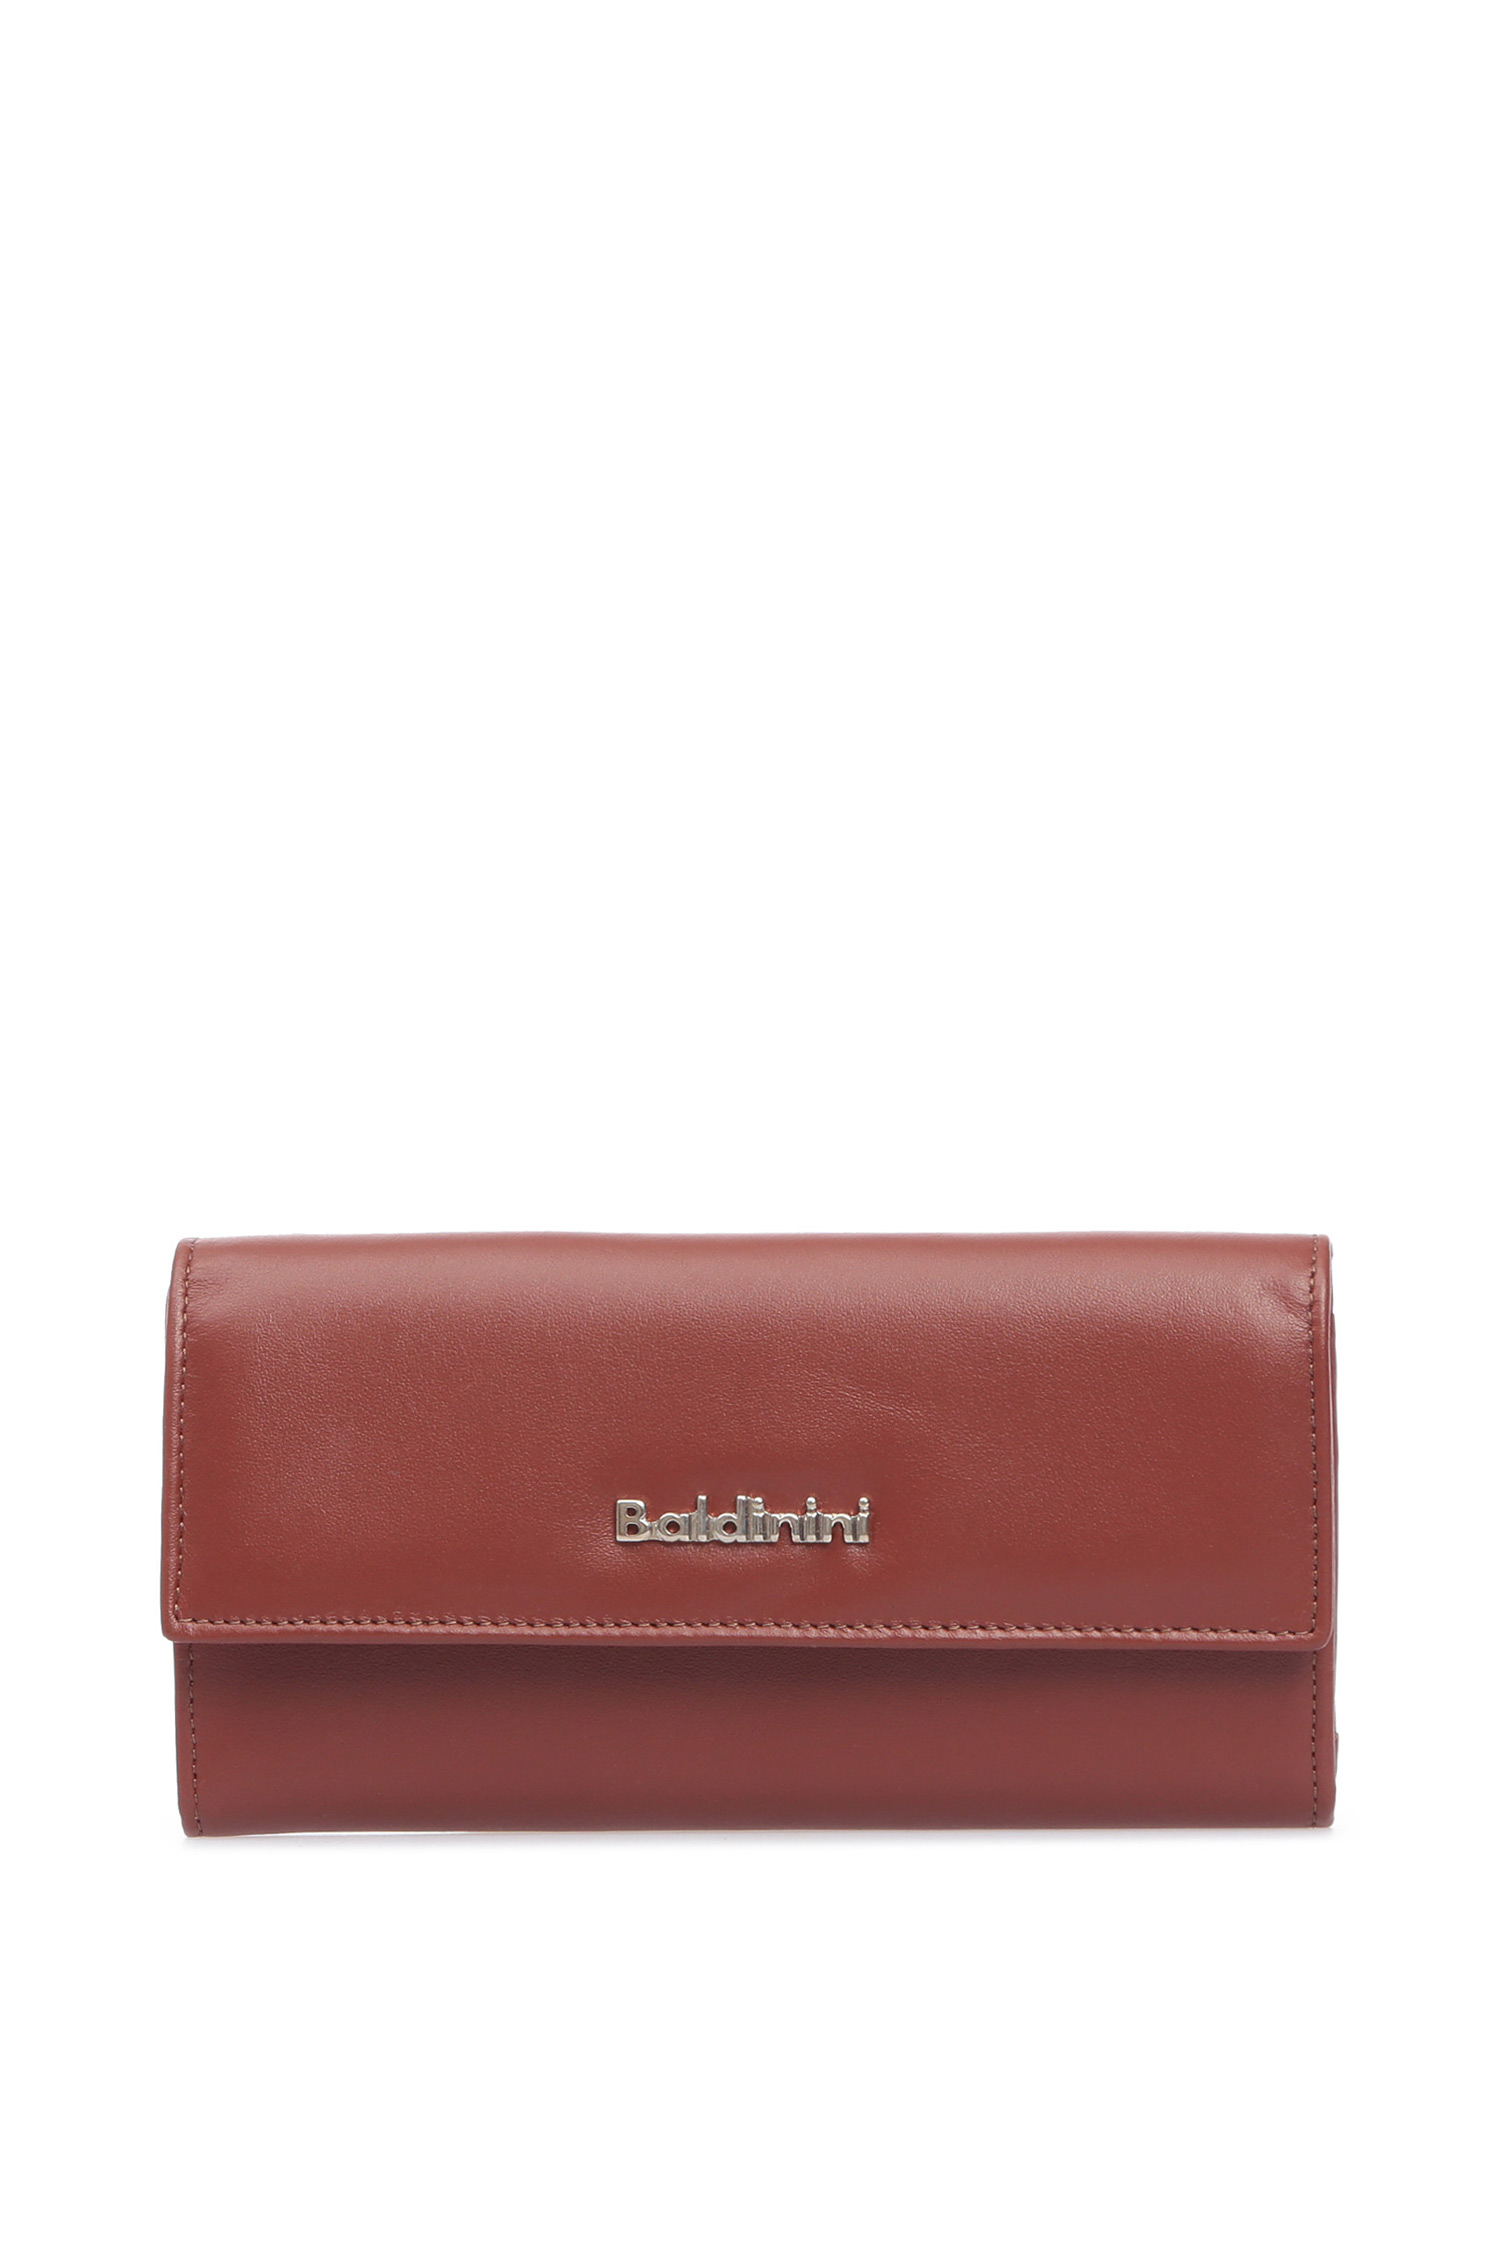 Женский коричневый кожаный кошелек Baldinini 870353;3080